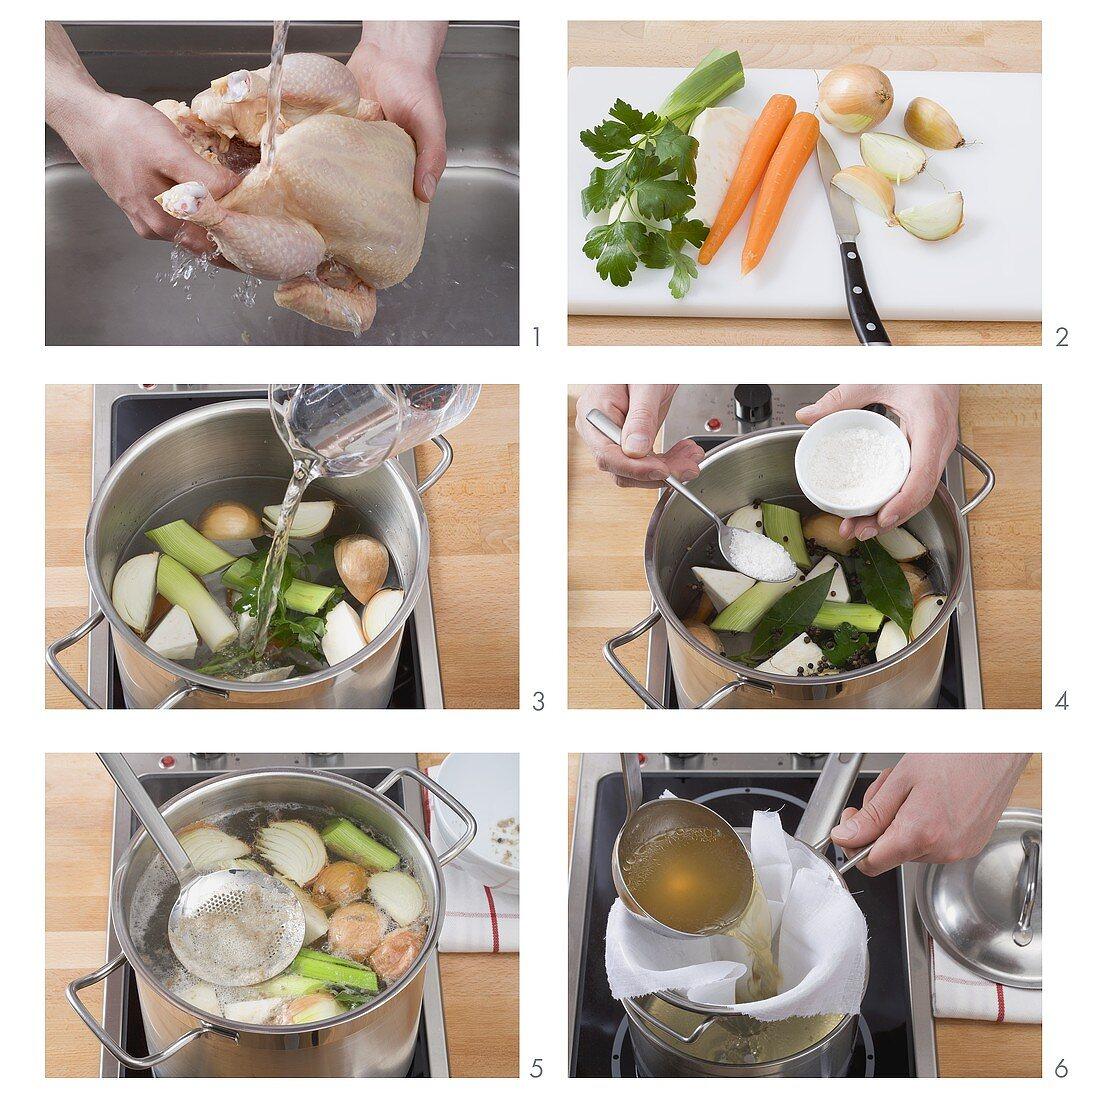 Making chicken stock